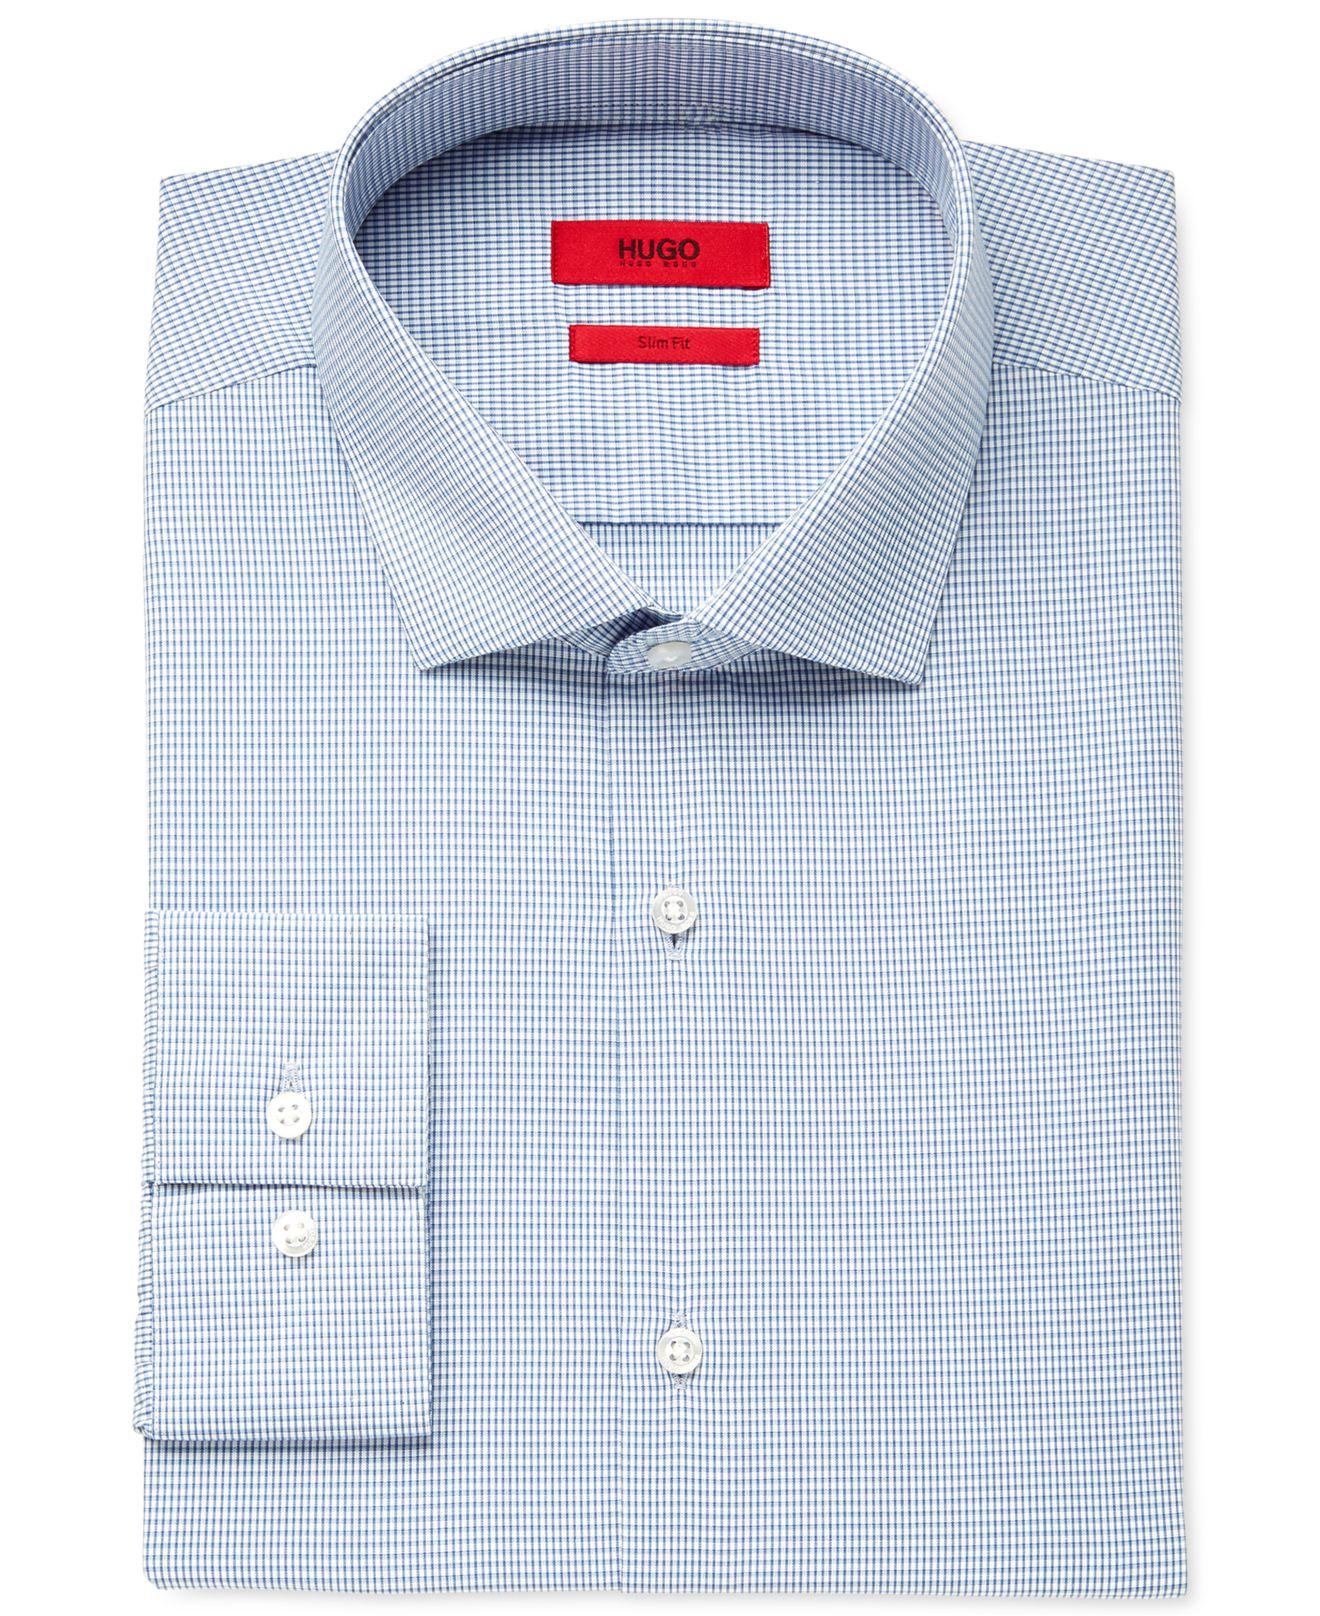 Boss hugo slim fit light blue micro check dress shirt in for Hugo boss formal shirts